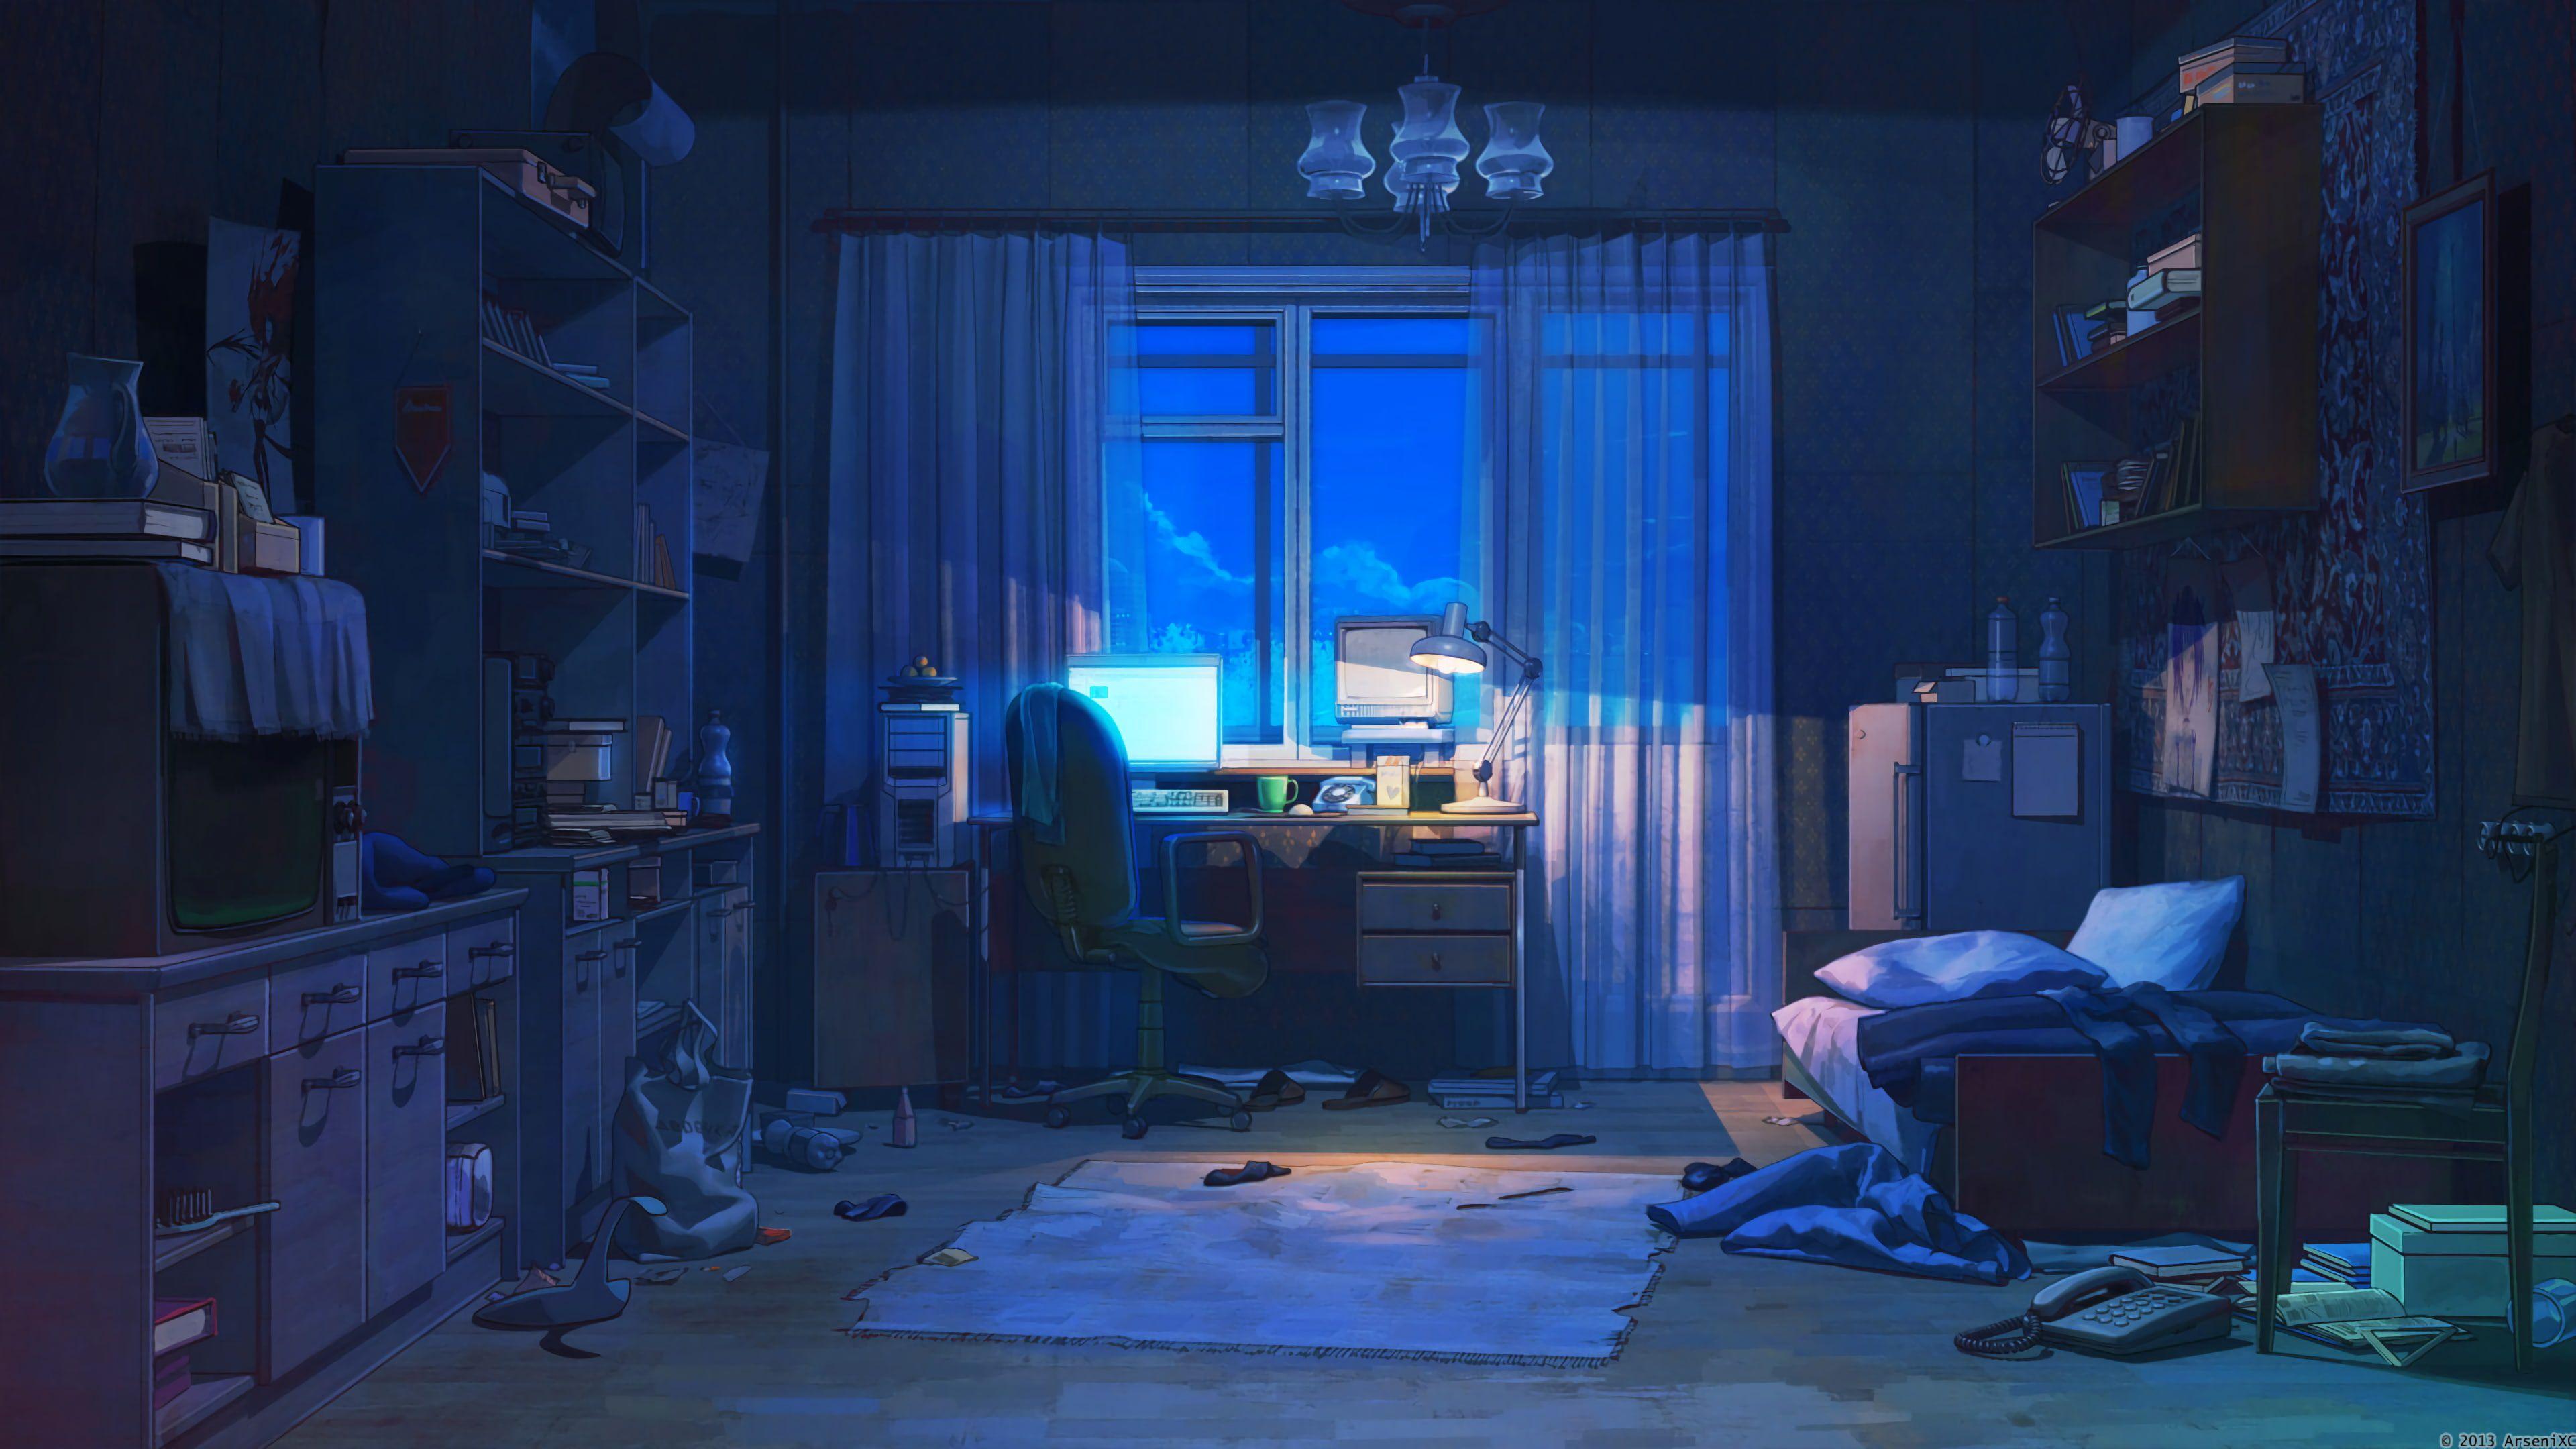 Anime Room Interior Dark Everlasting Summer Arseniy Chebynkin 4k Wallpaper Hdwallpaper Desktop Anime Scenery Scenery Background Anime Background